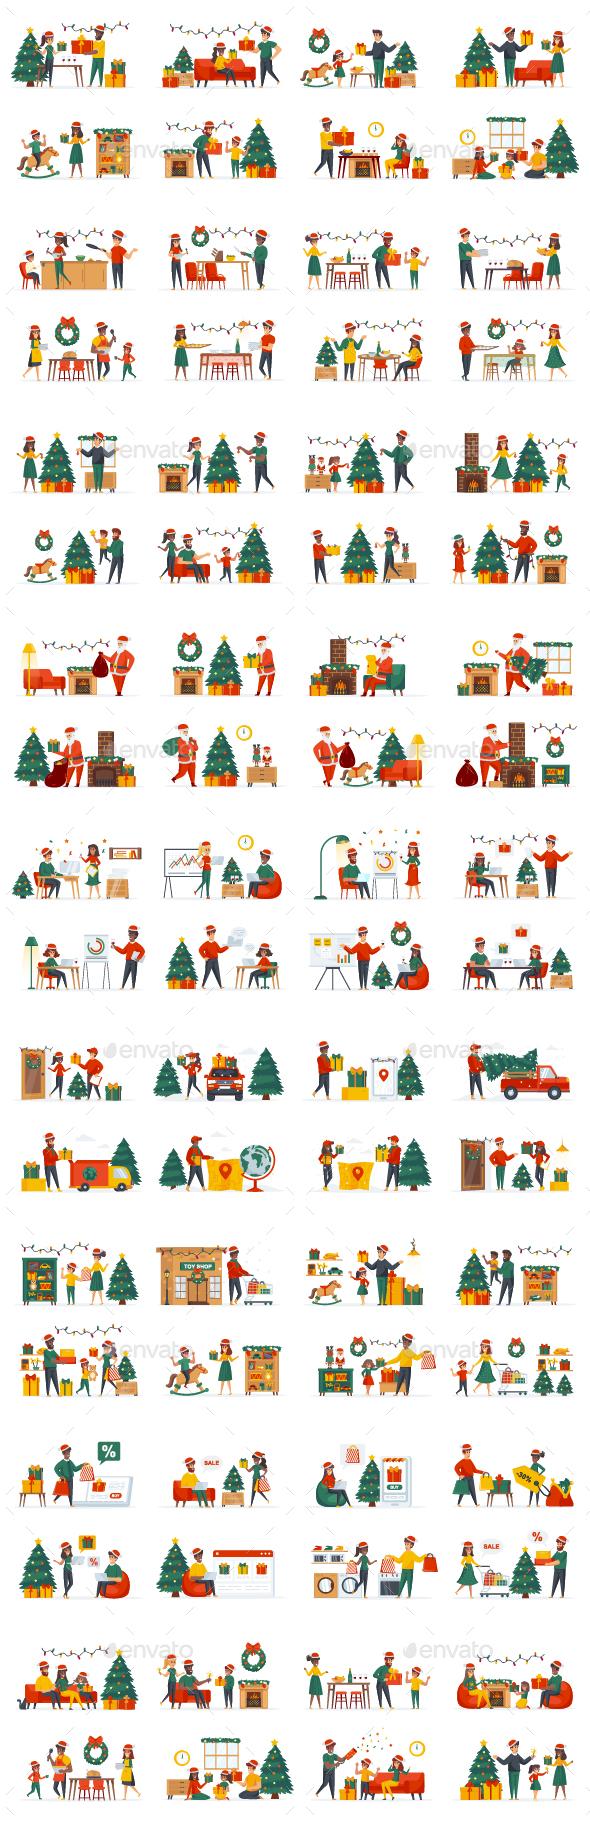 Christmas People Character Scene Creator Kit